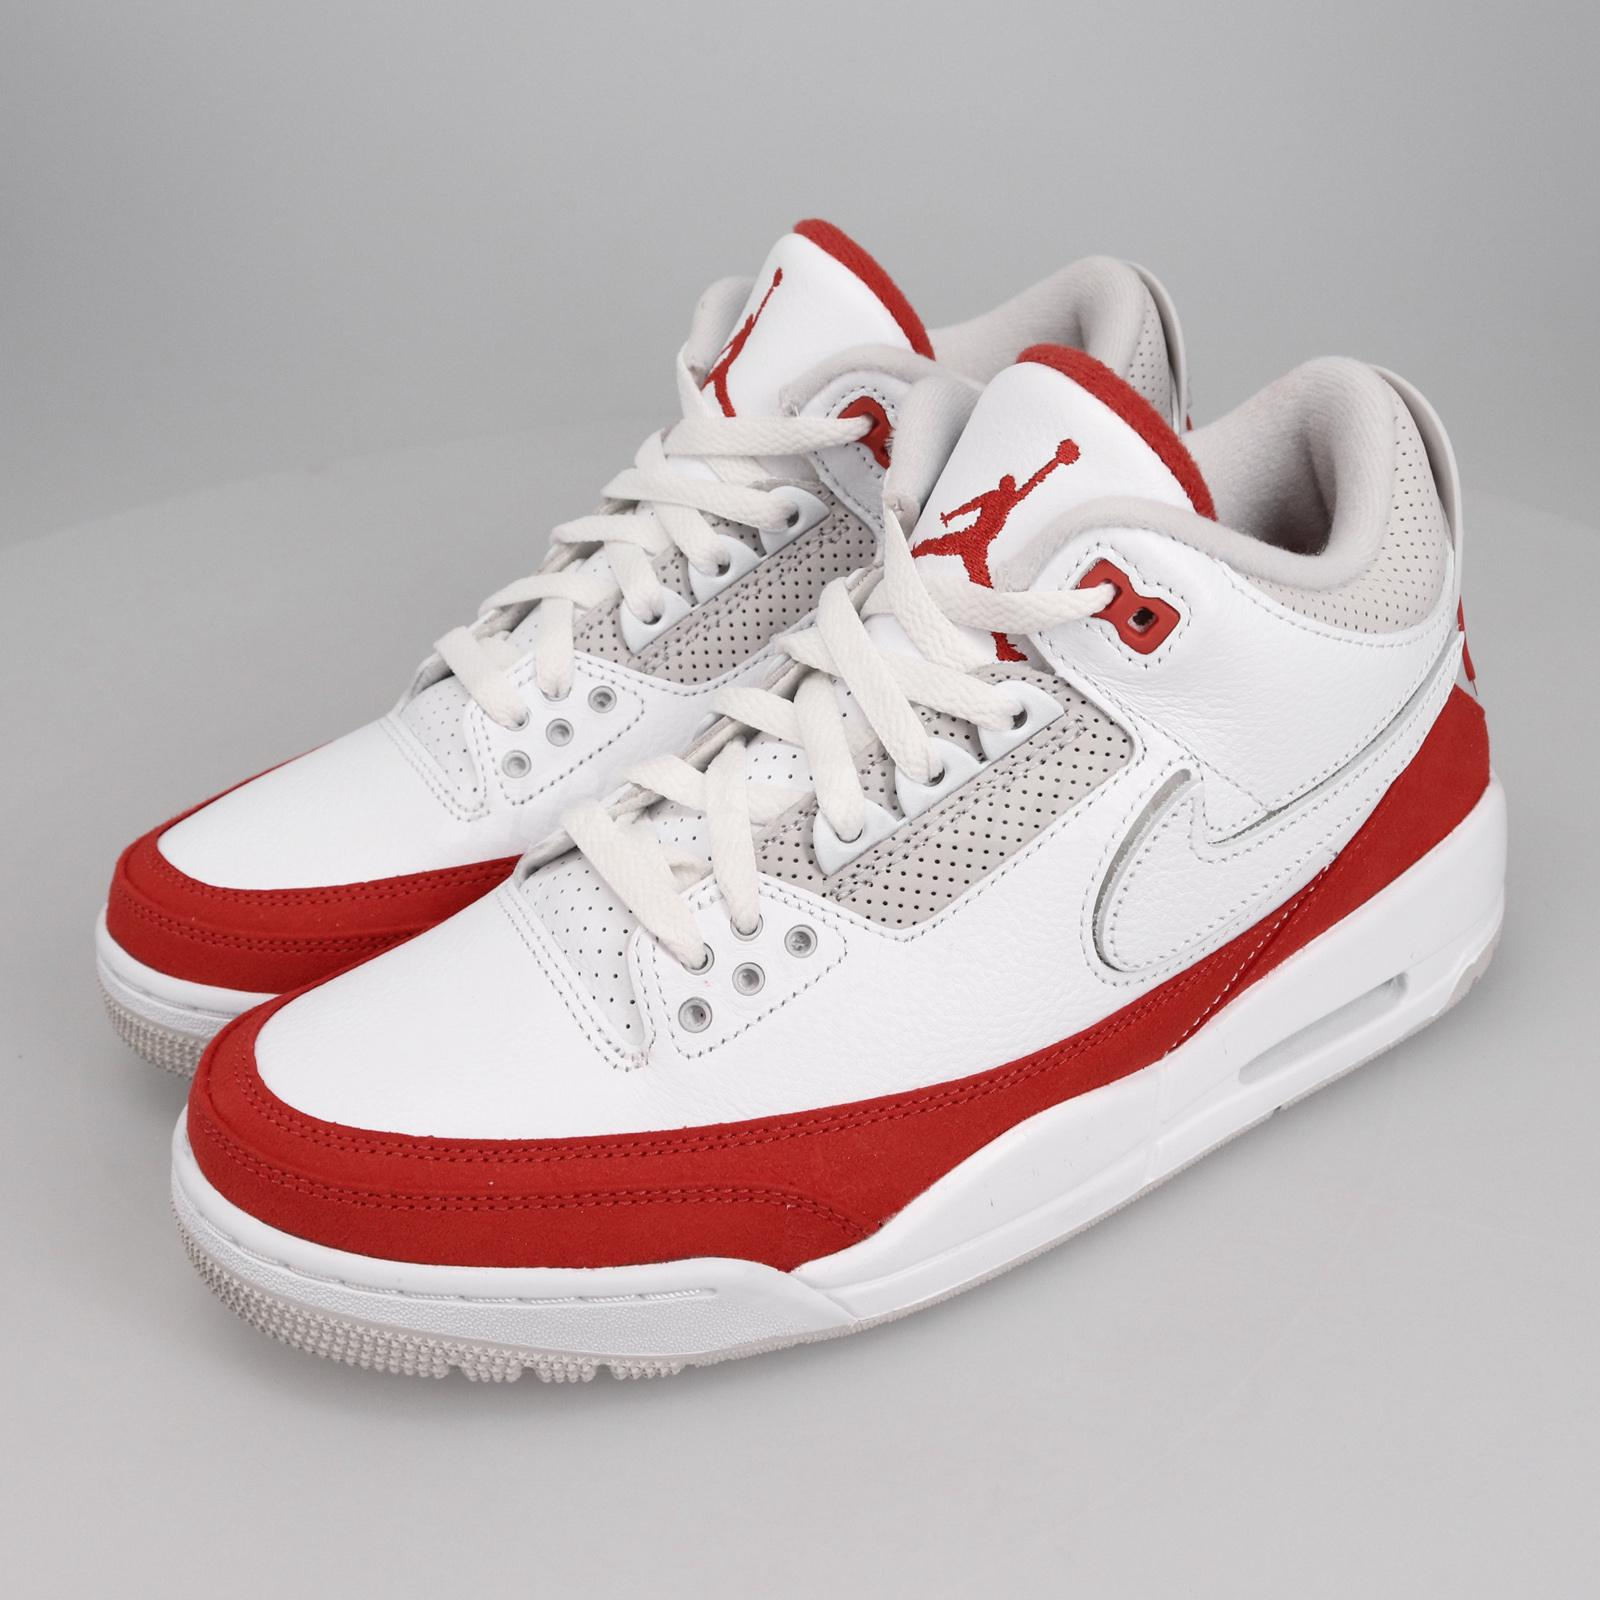 Nike Air Jordan 3 Retro TH SP SHOELACE